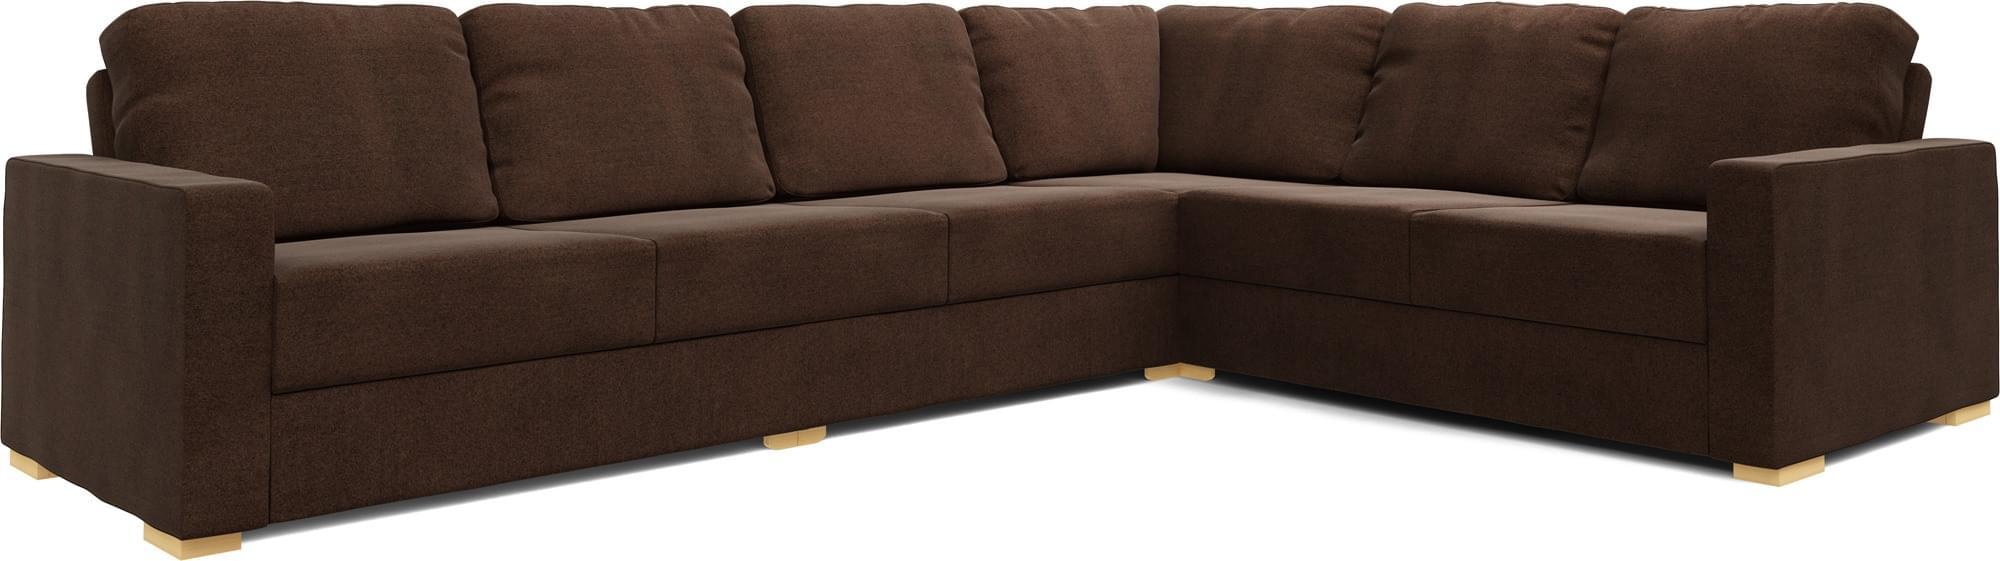 Alda 4X3 Corner Double Sofa Bed